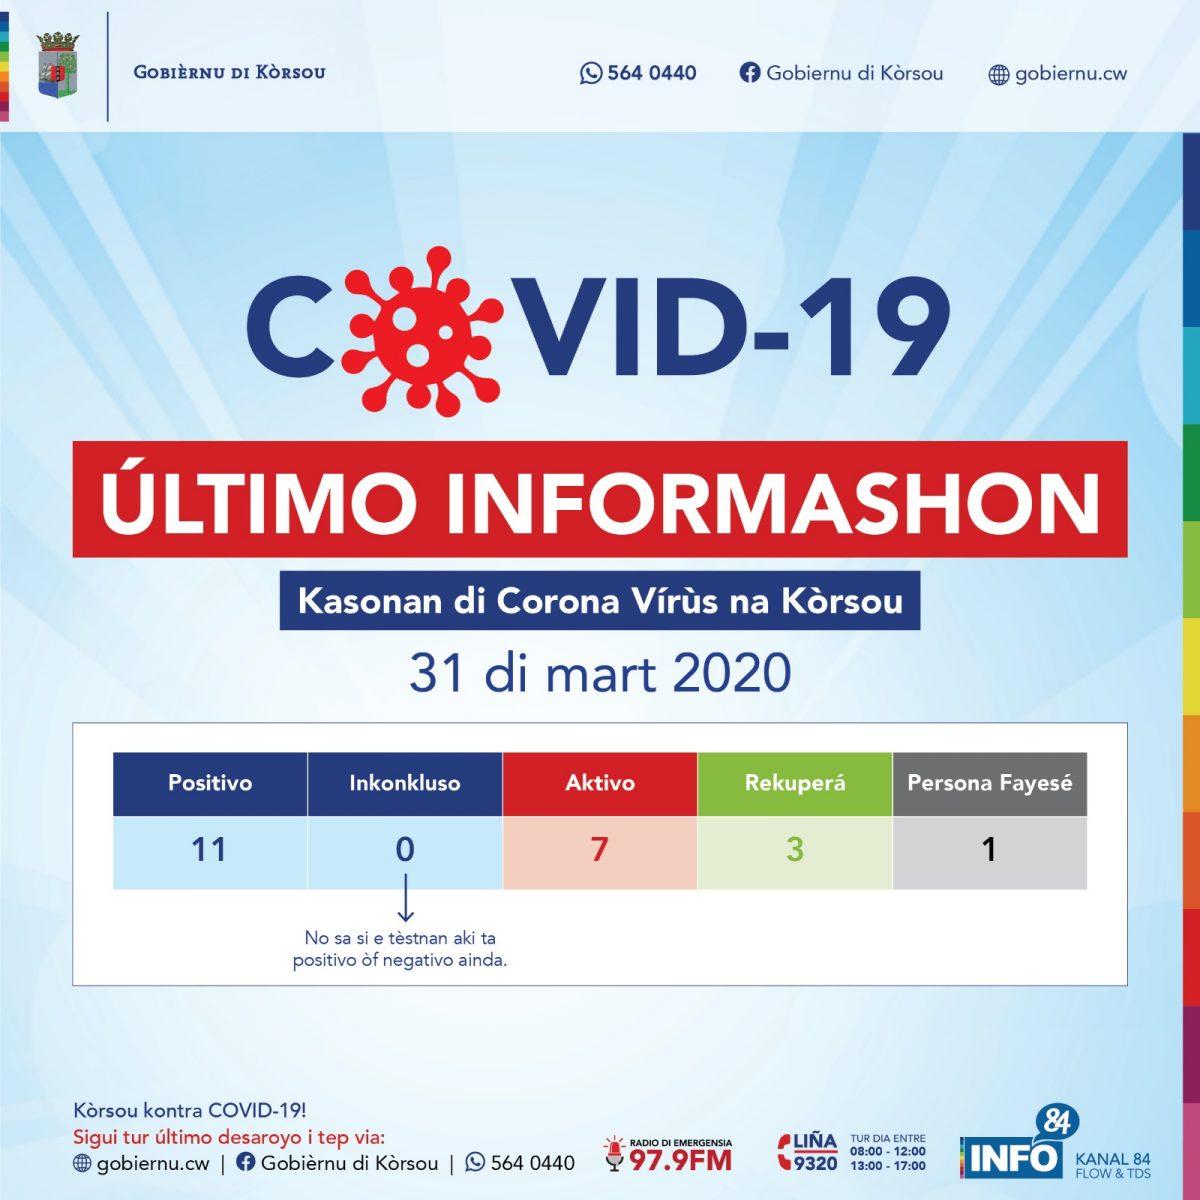 Kasonan di Corona Vírùs na Kòrsou 31 di maart 2020